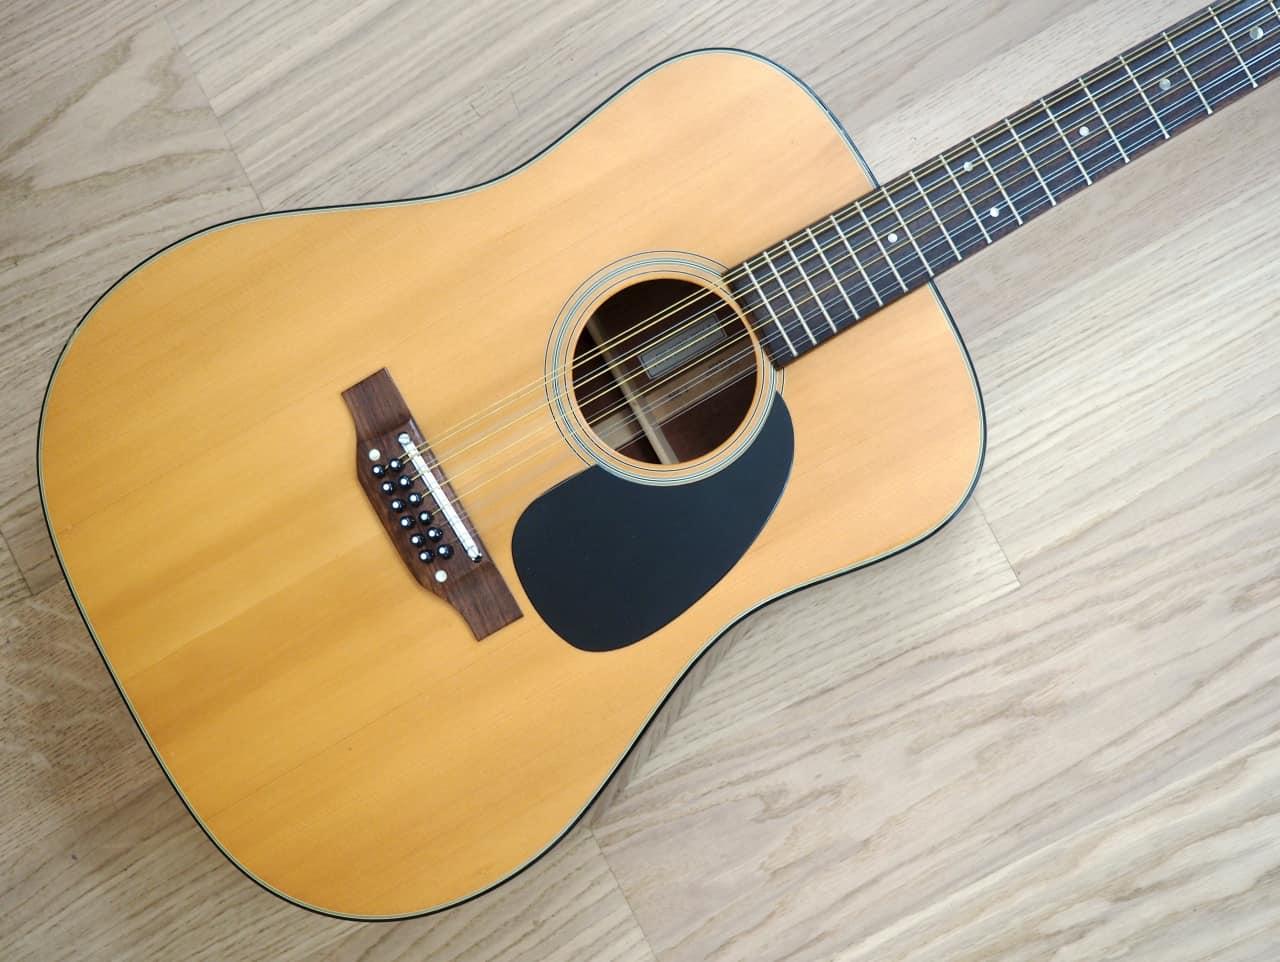 1977 takamine f 385 dreadnought 12 string acoustic guitar reverb. Black Bedroom Furniture Sets. Home Design Ideas